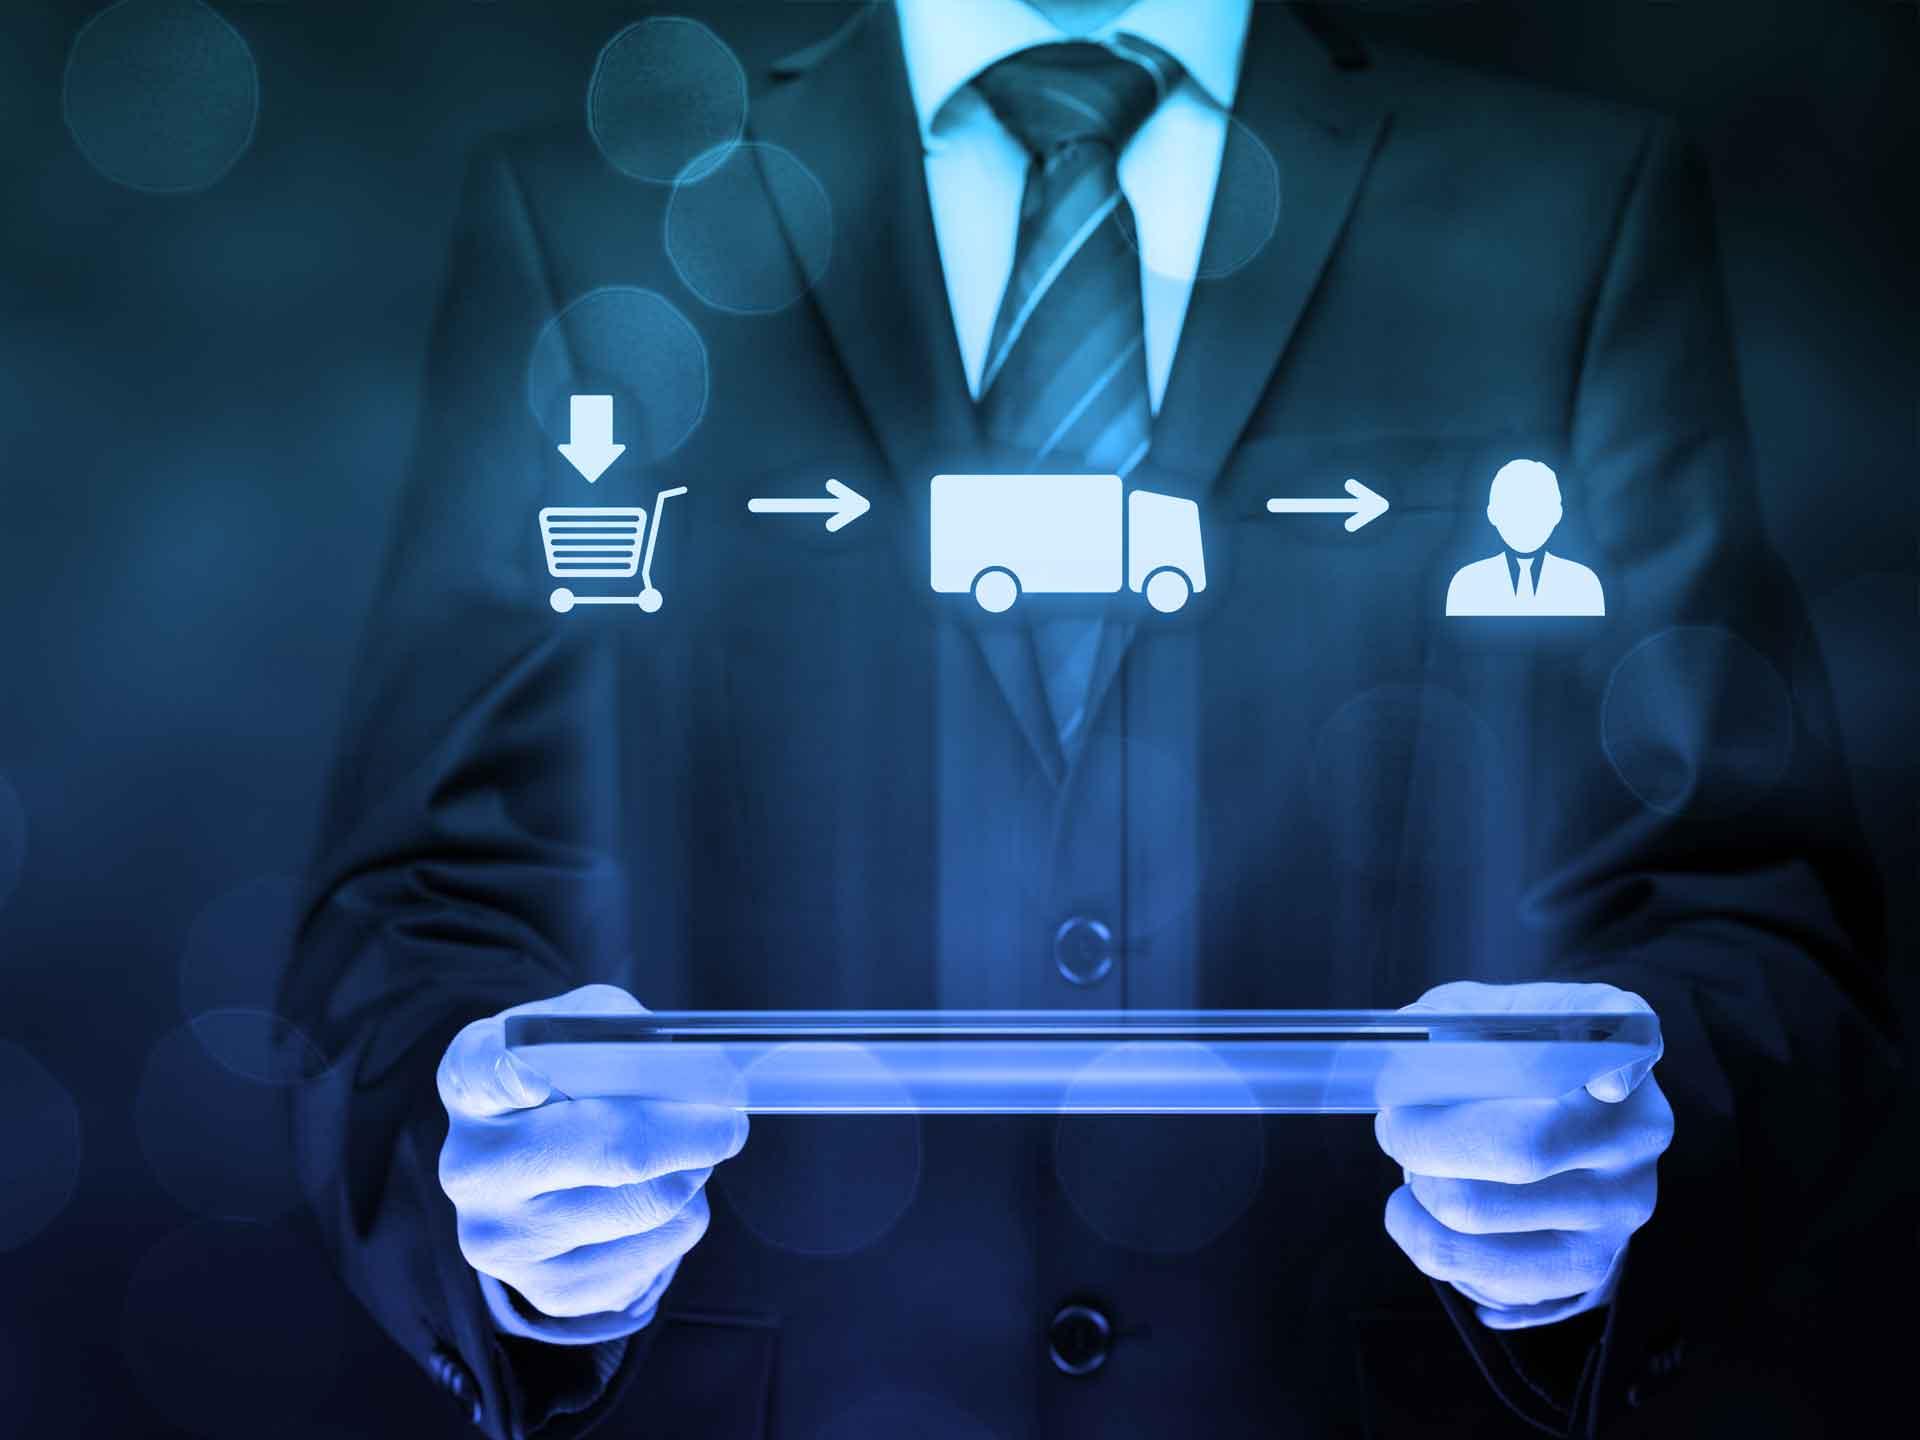 Wholesale & Distribution | Umfassendes Supply Chain Management